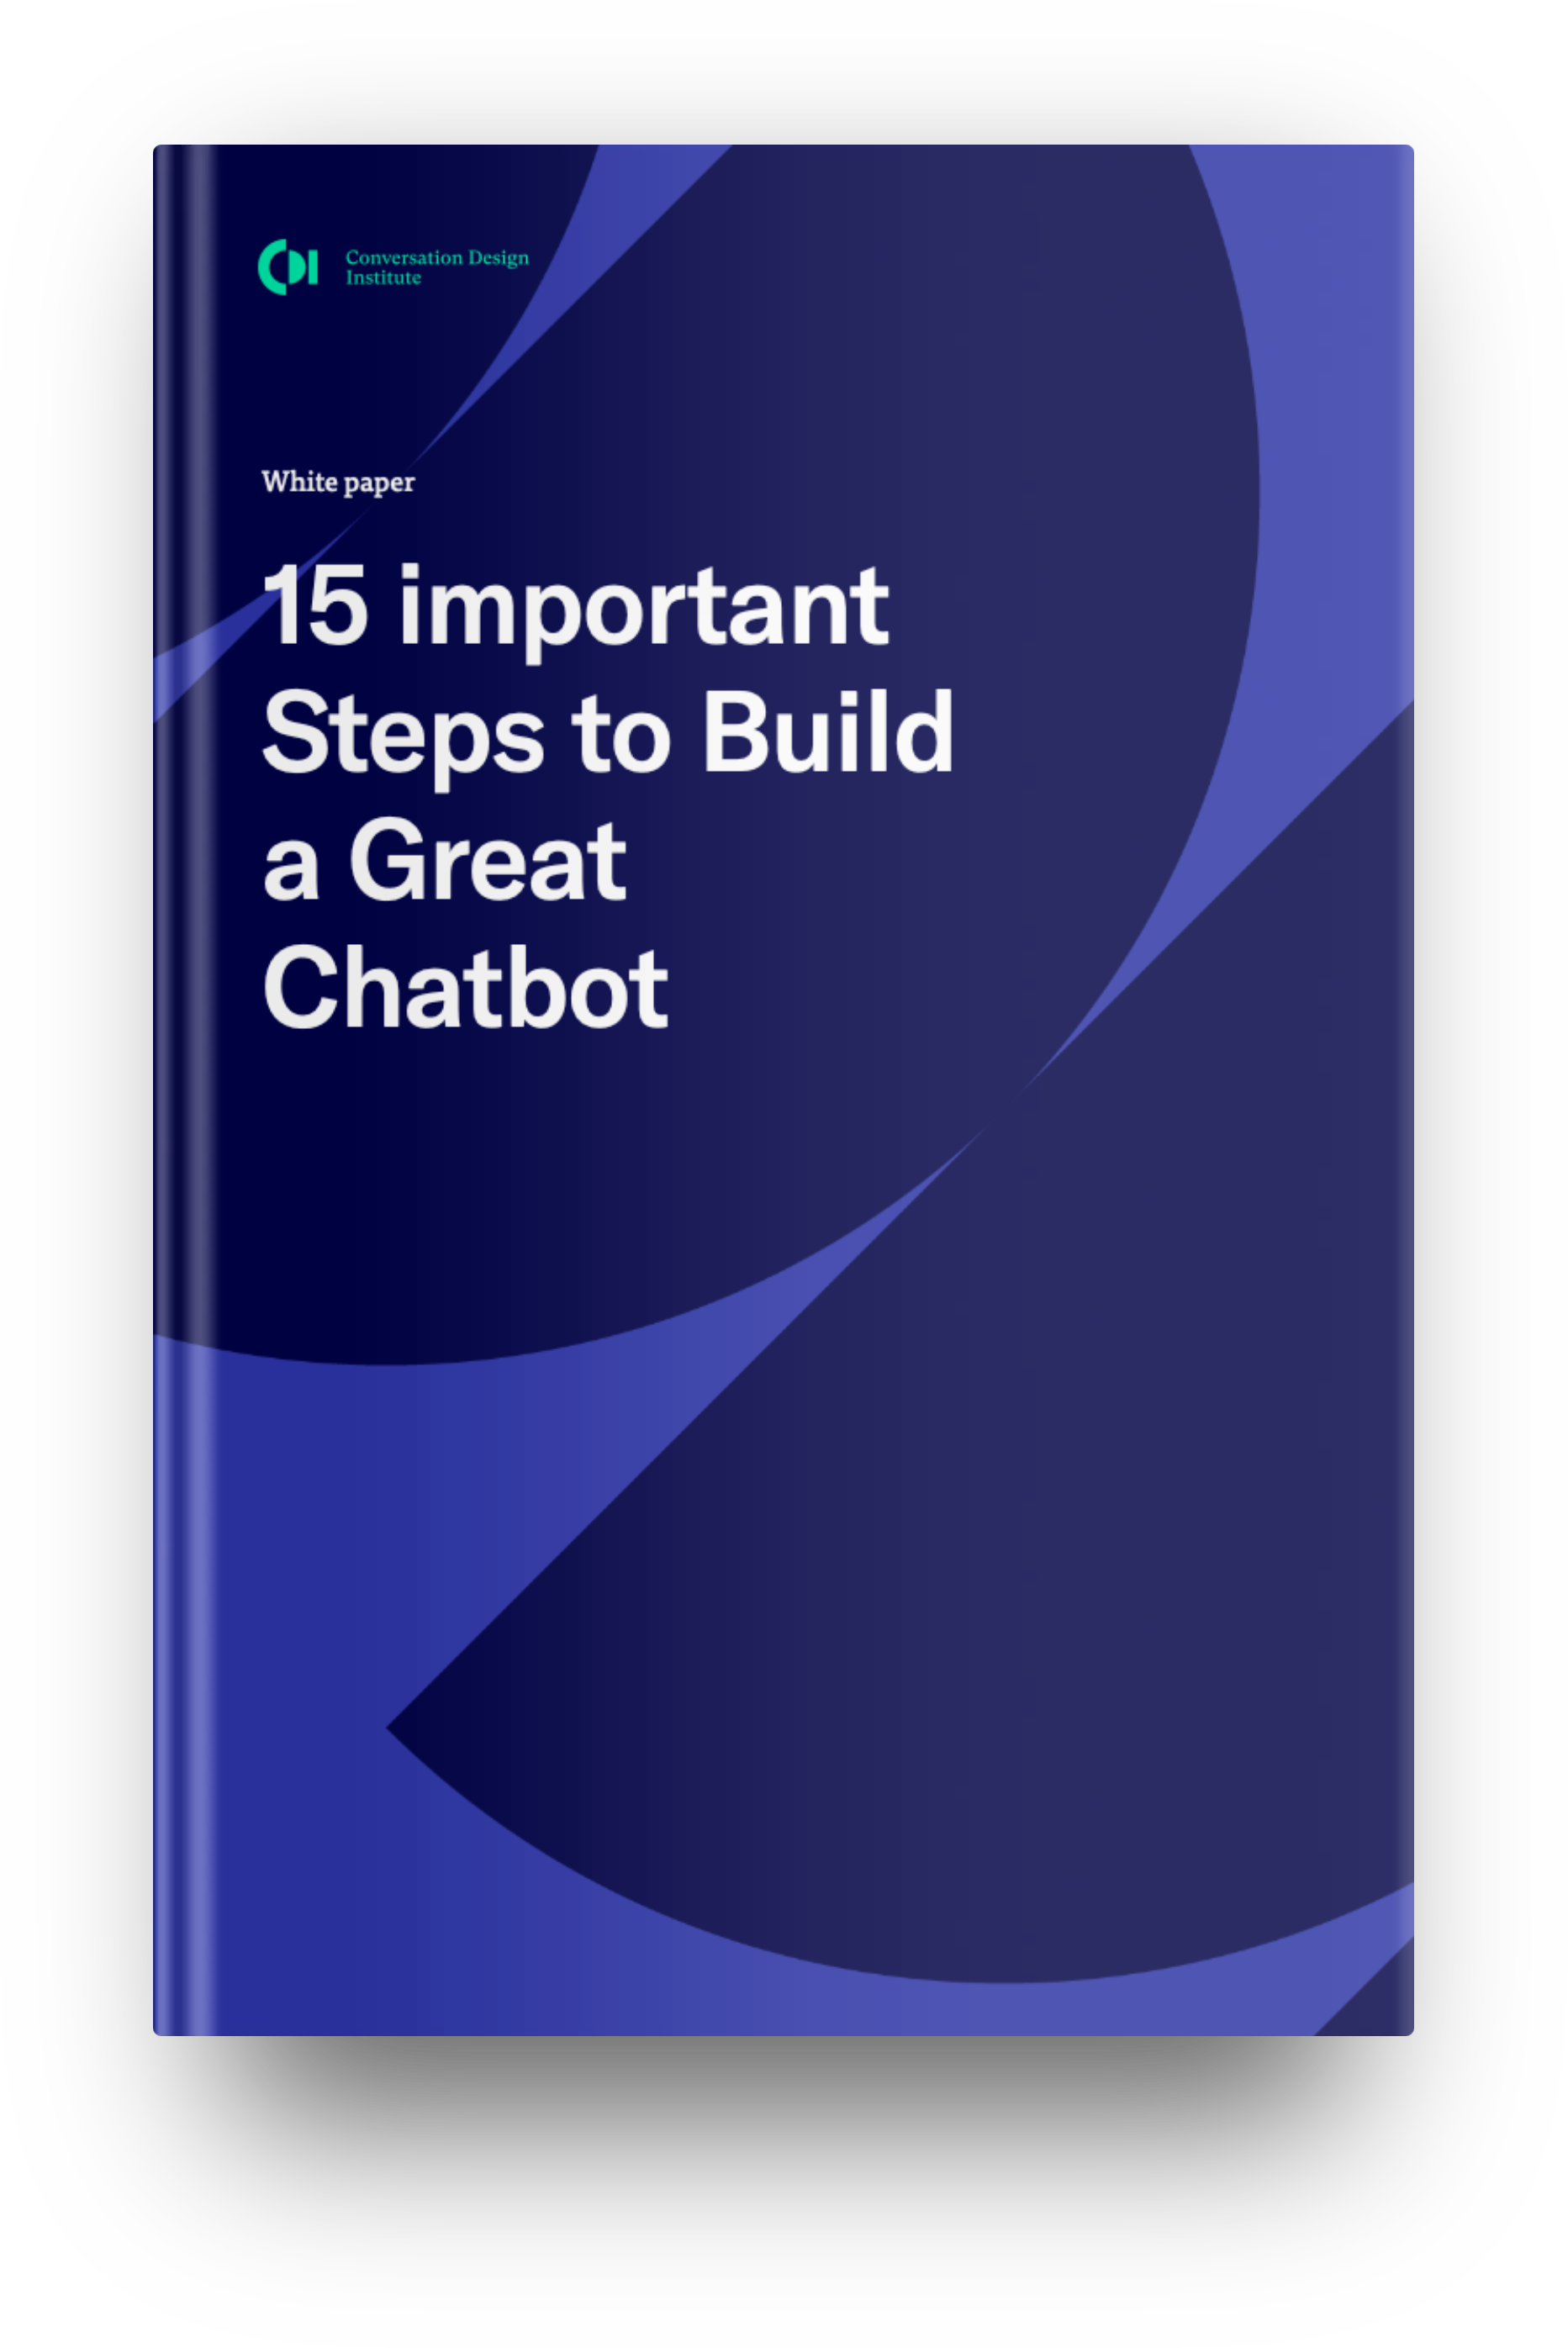 WP - important steps build chatbot